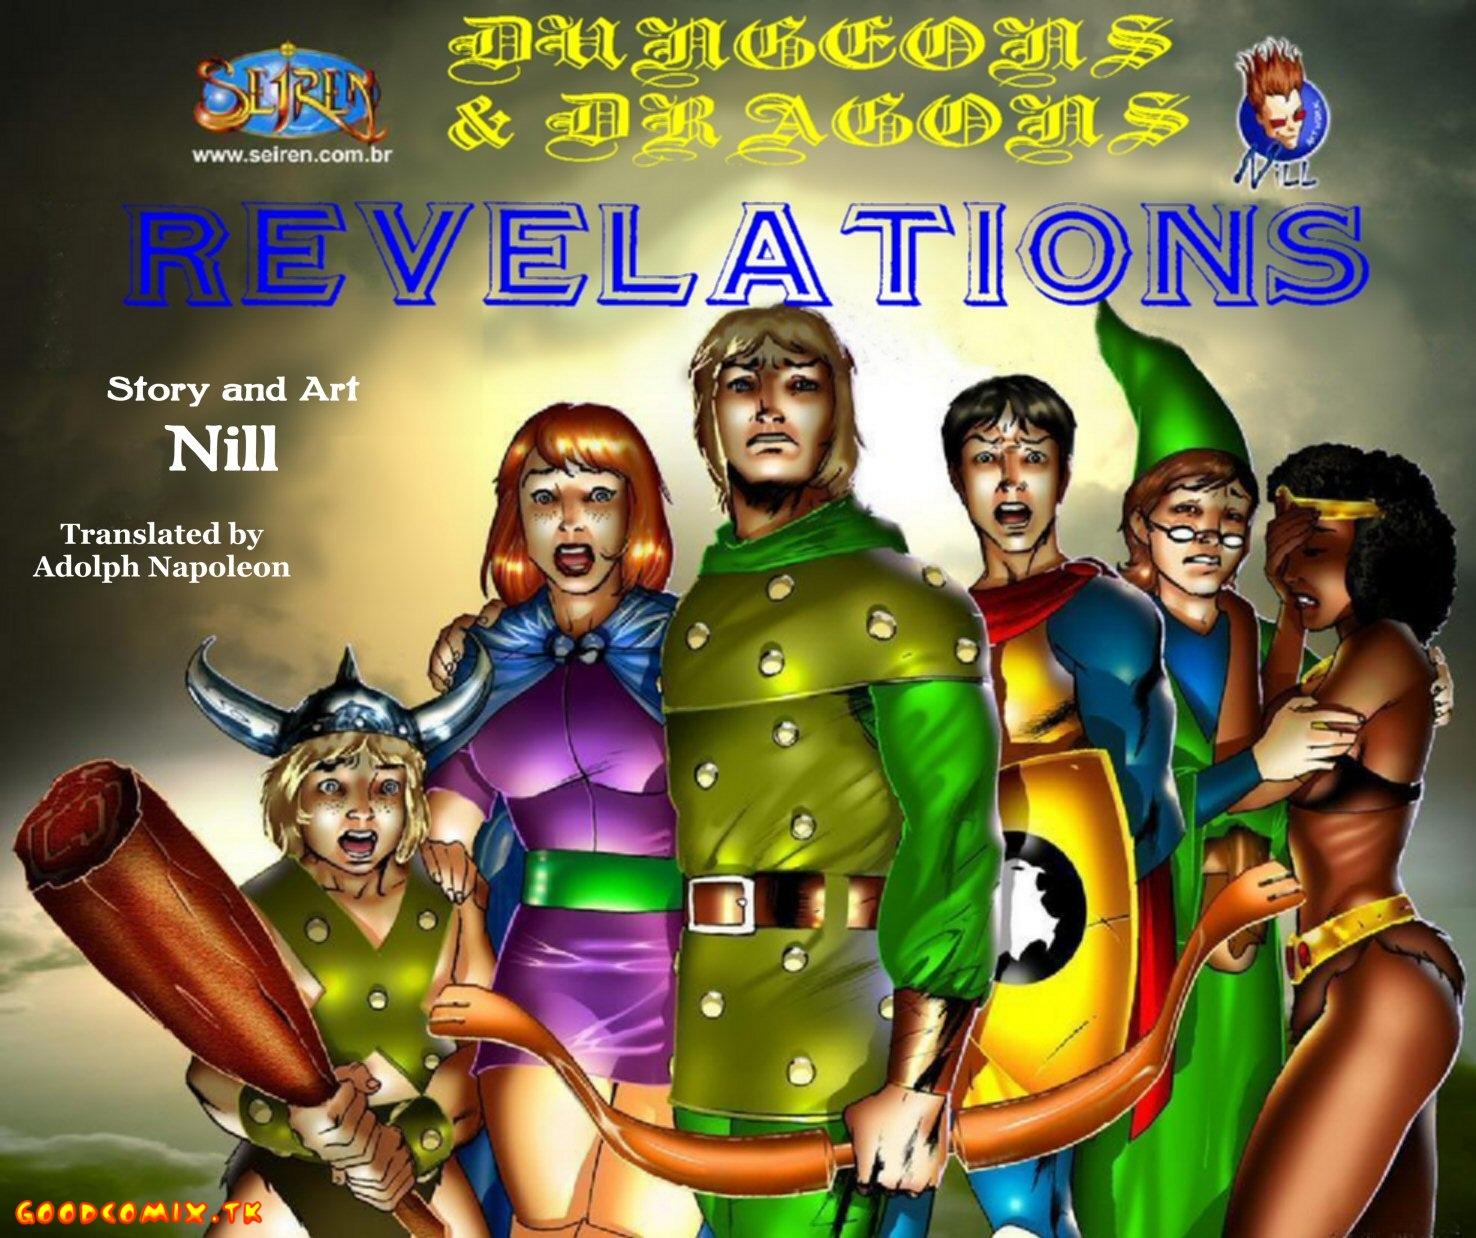 Goodcomix.tk Dungeons & Dragons - [Seiren][Nill] - Revelations